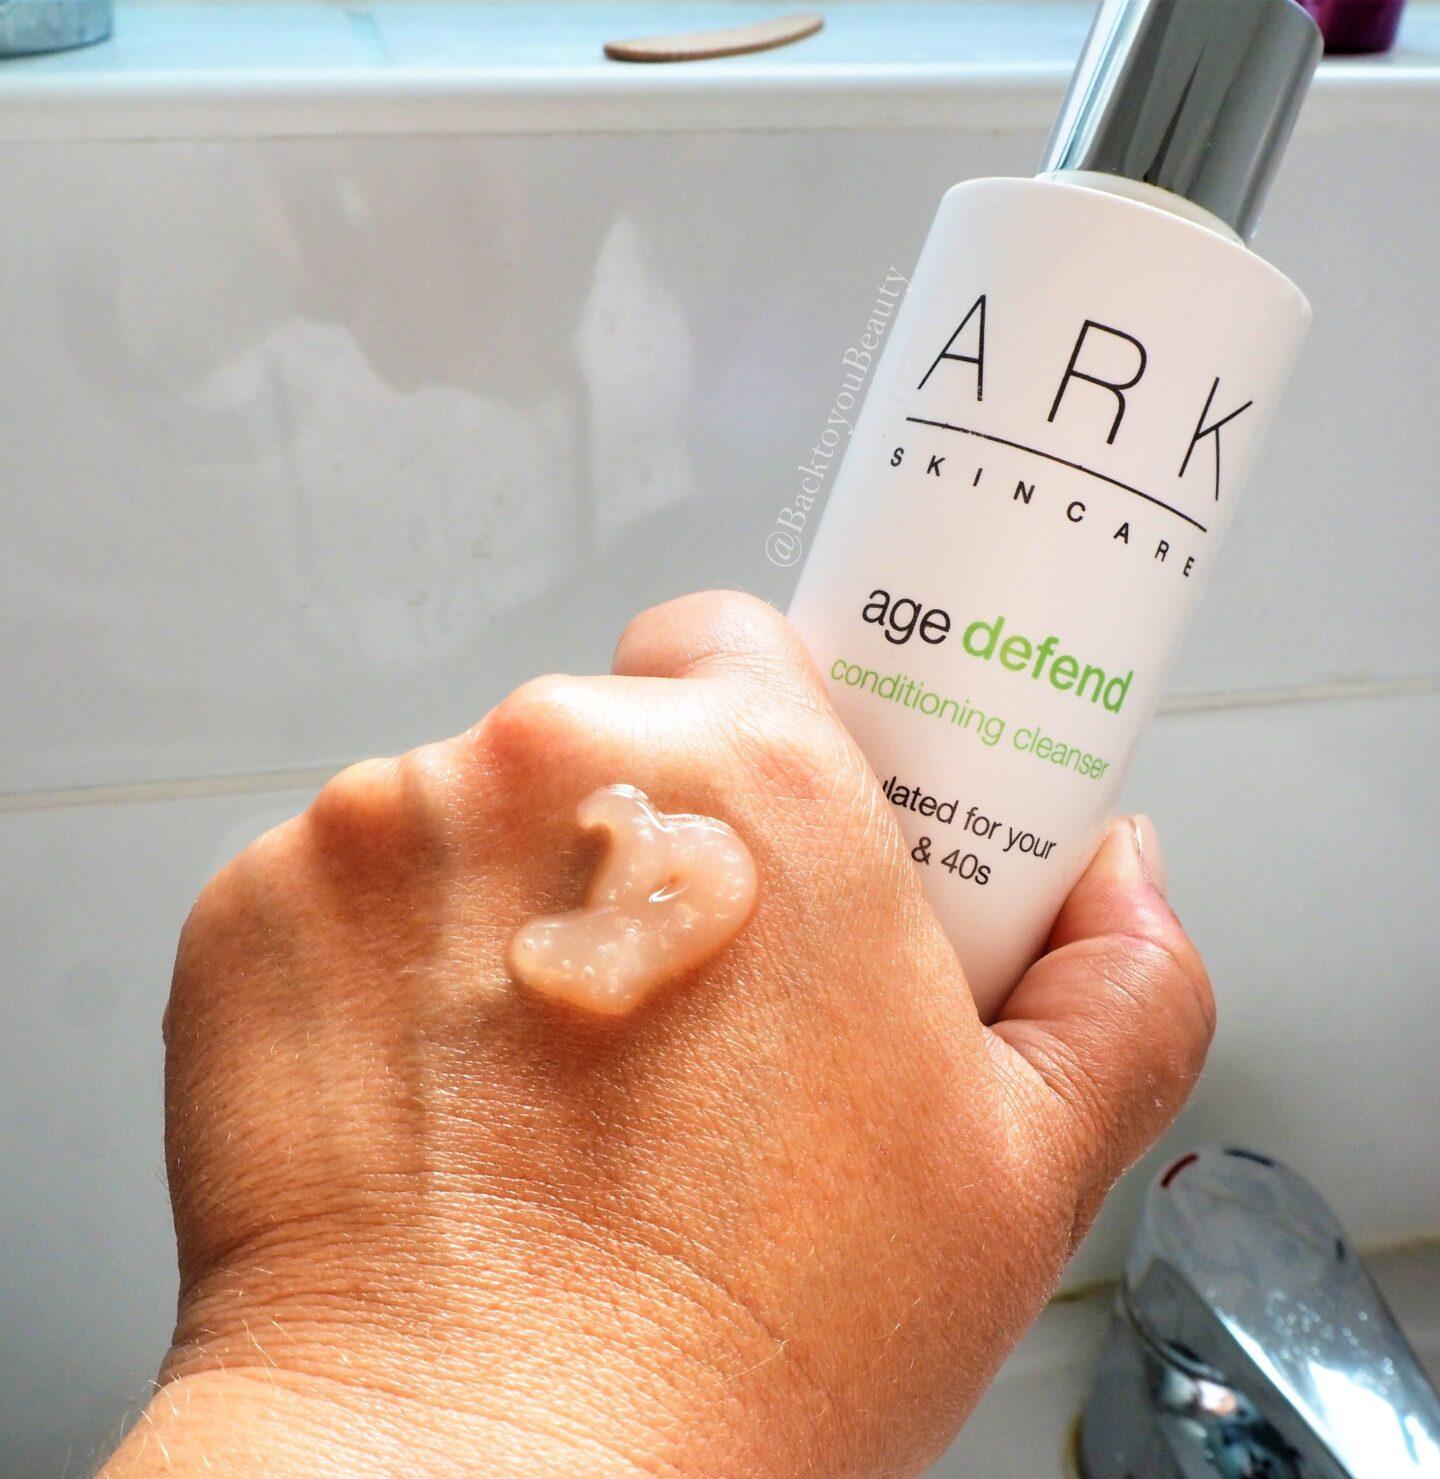 Ark Skincare Swatch